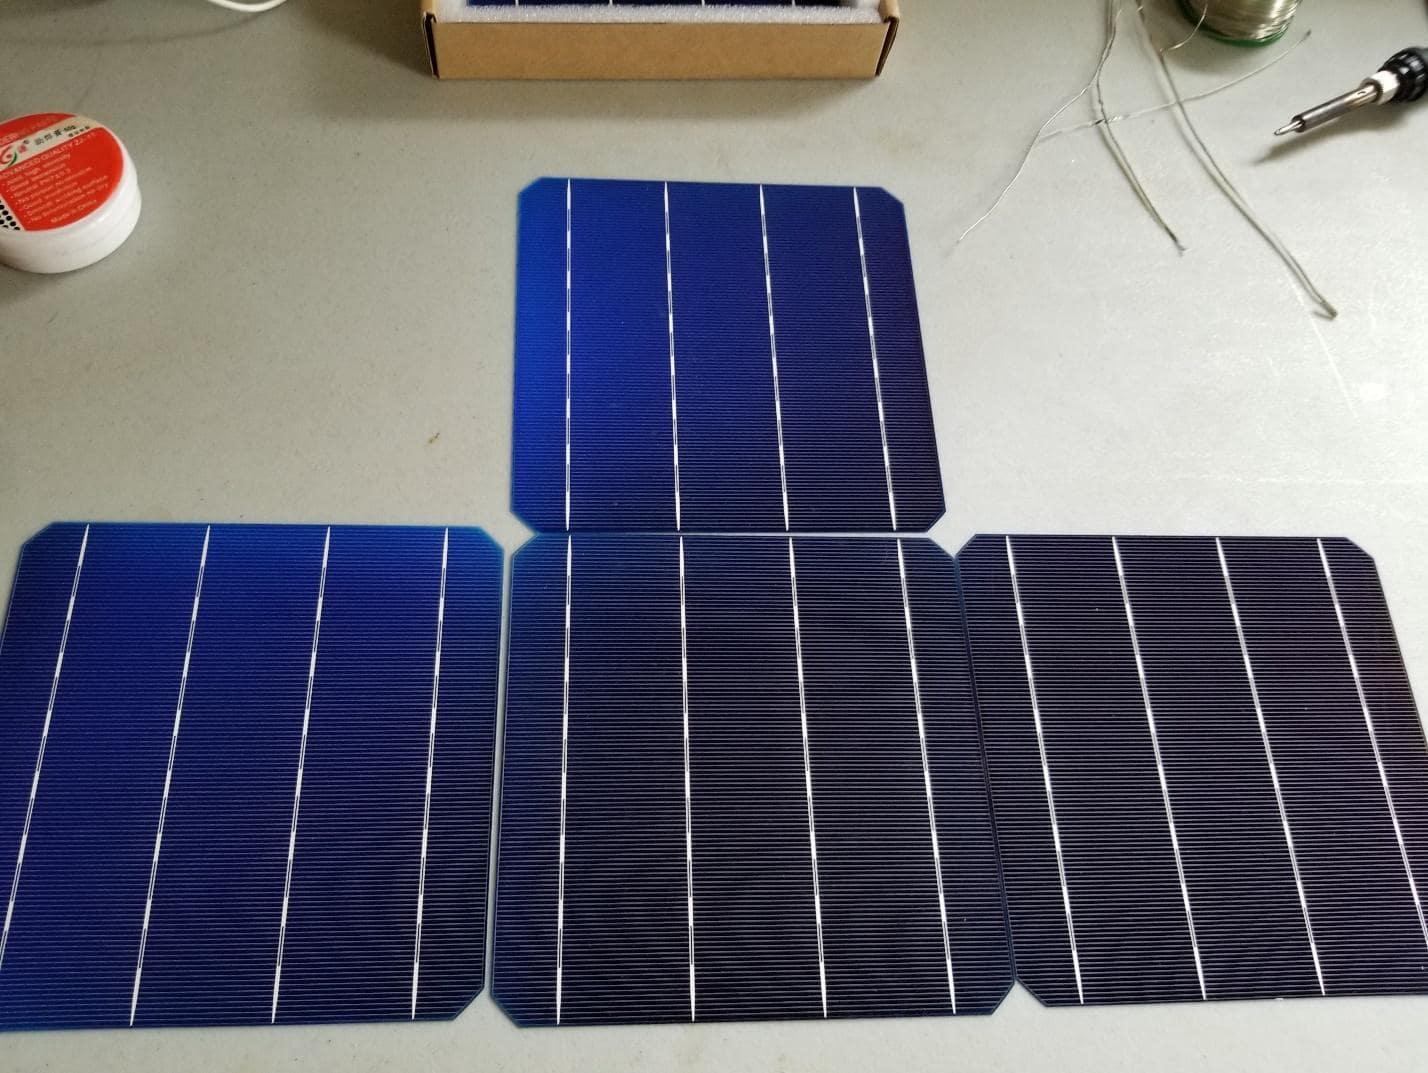 Solar_Panel_EP_MP_image4-min.jpg